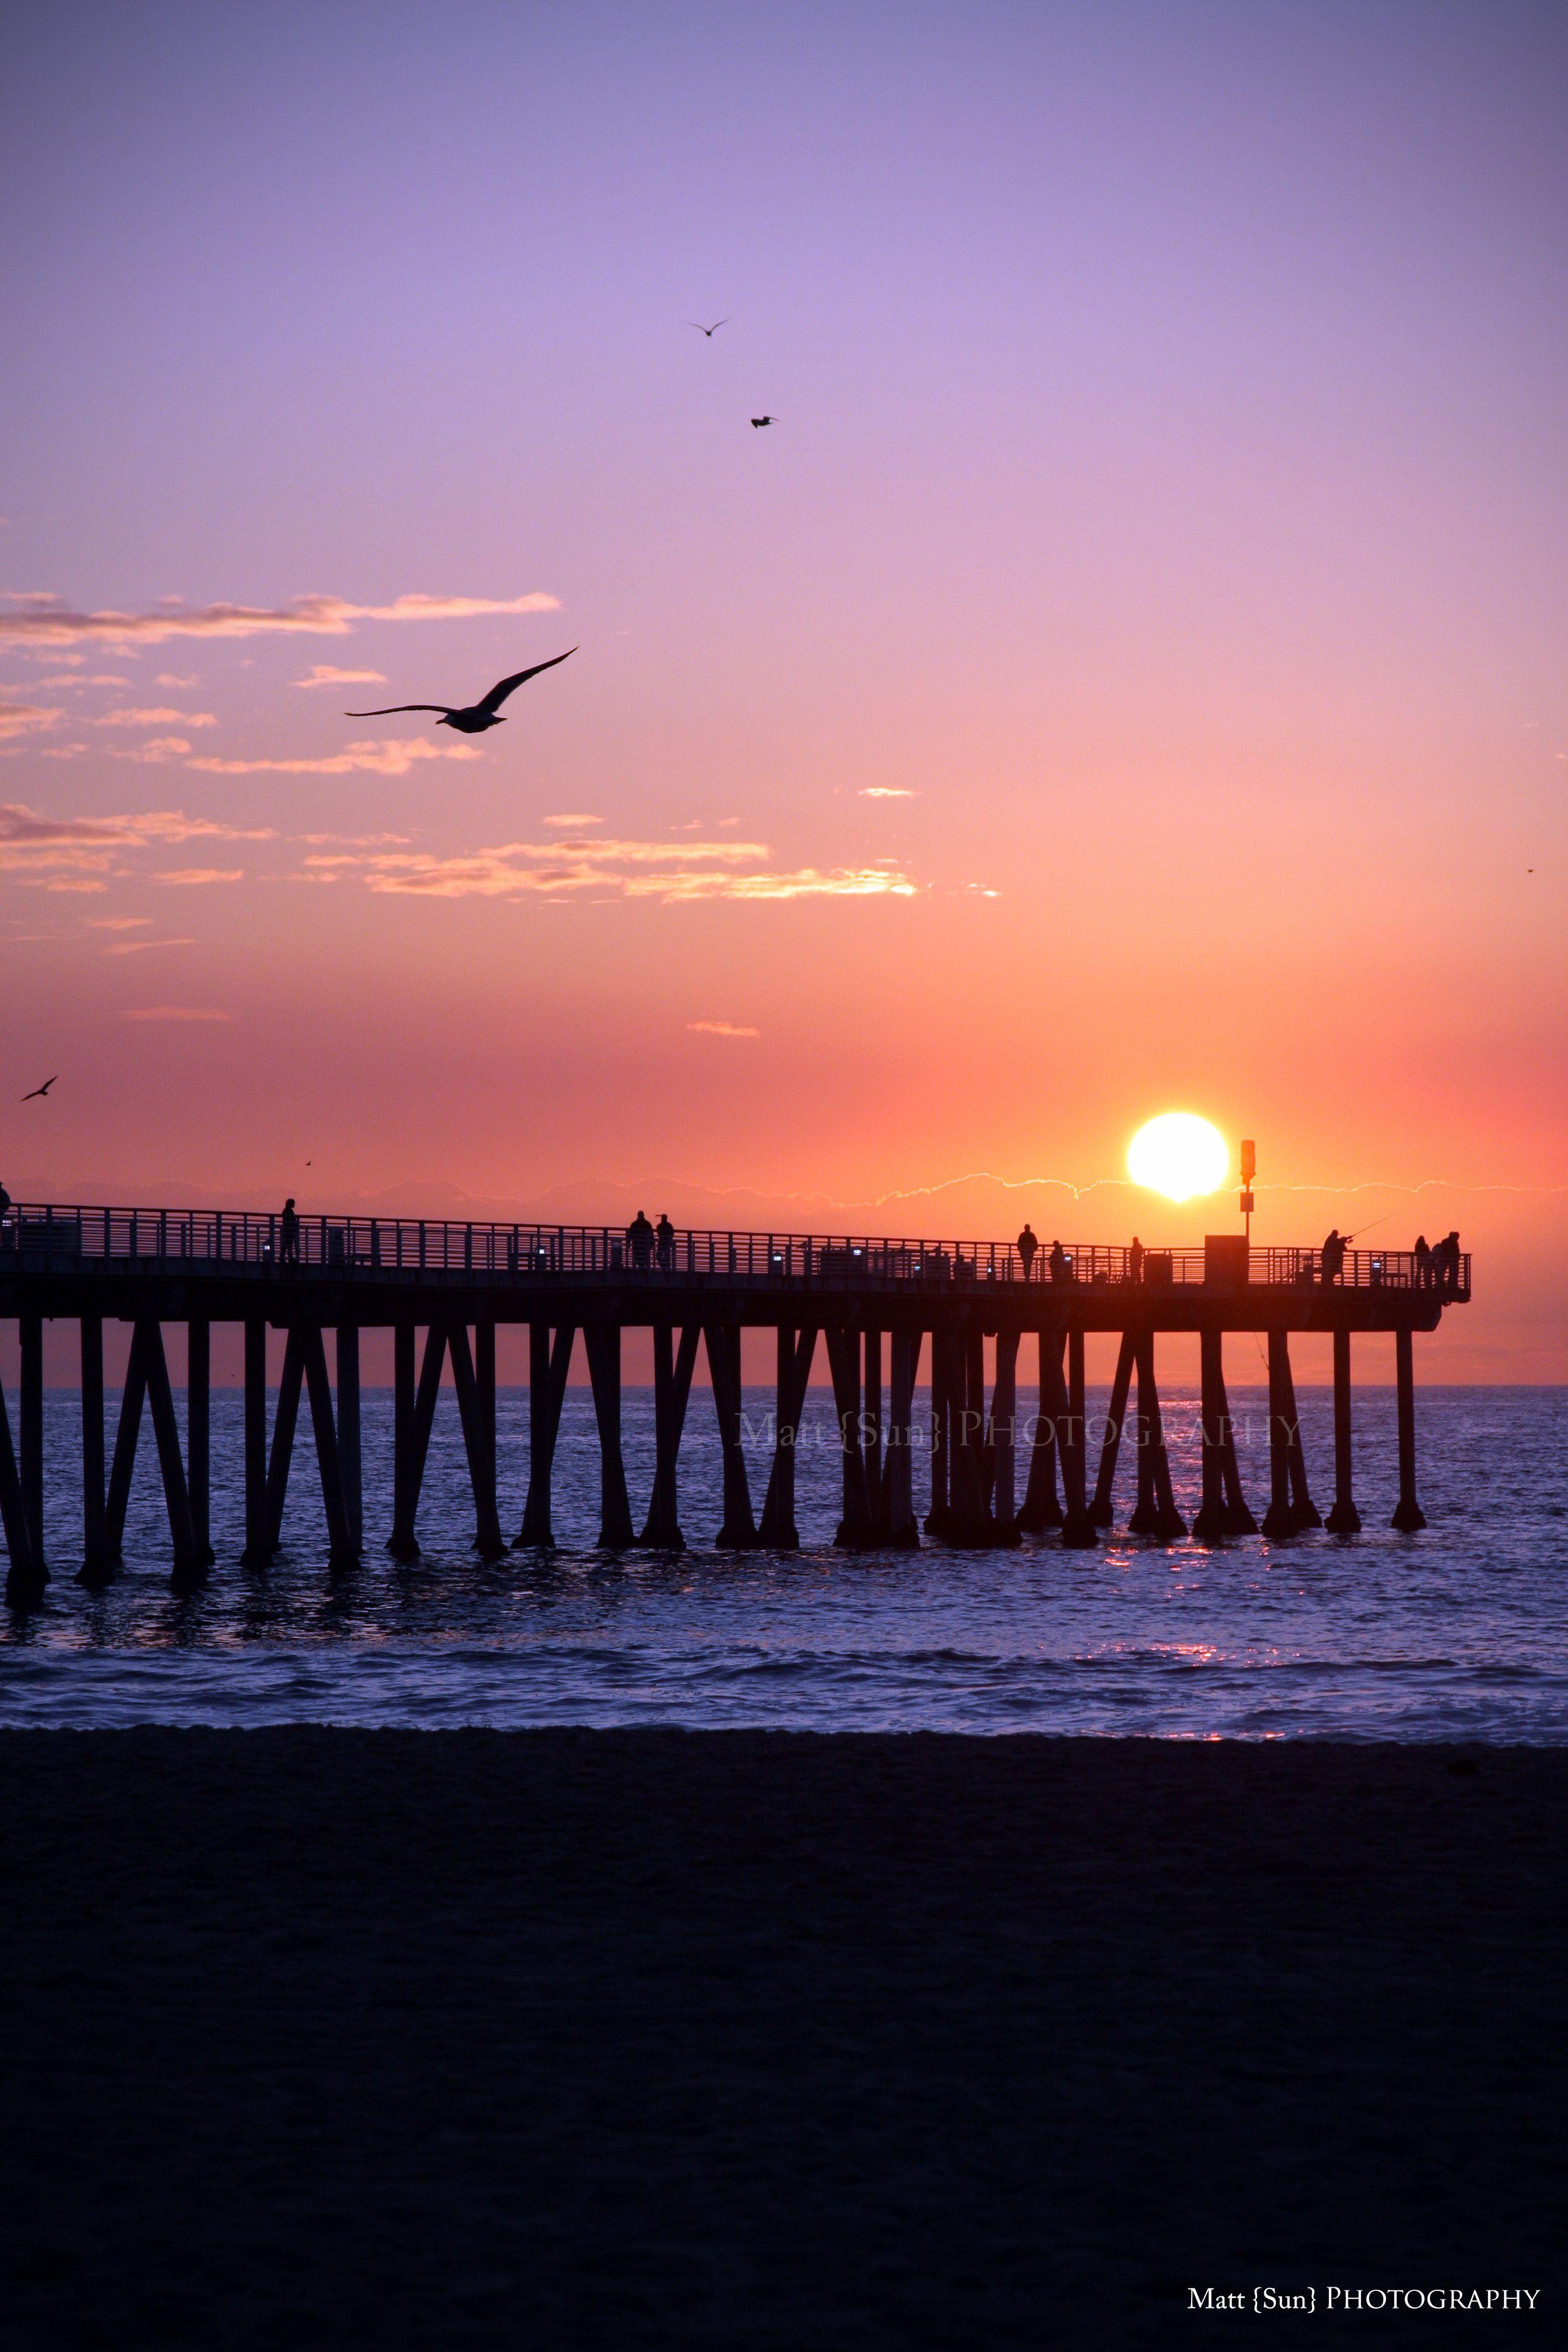 Sunset - Hermosa Beach, California - Explore the World with Travel ...